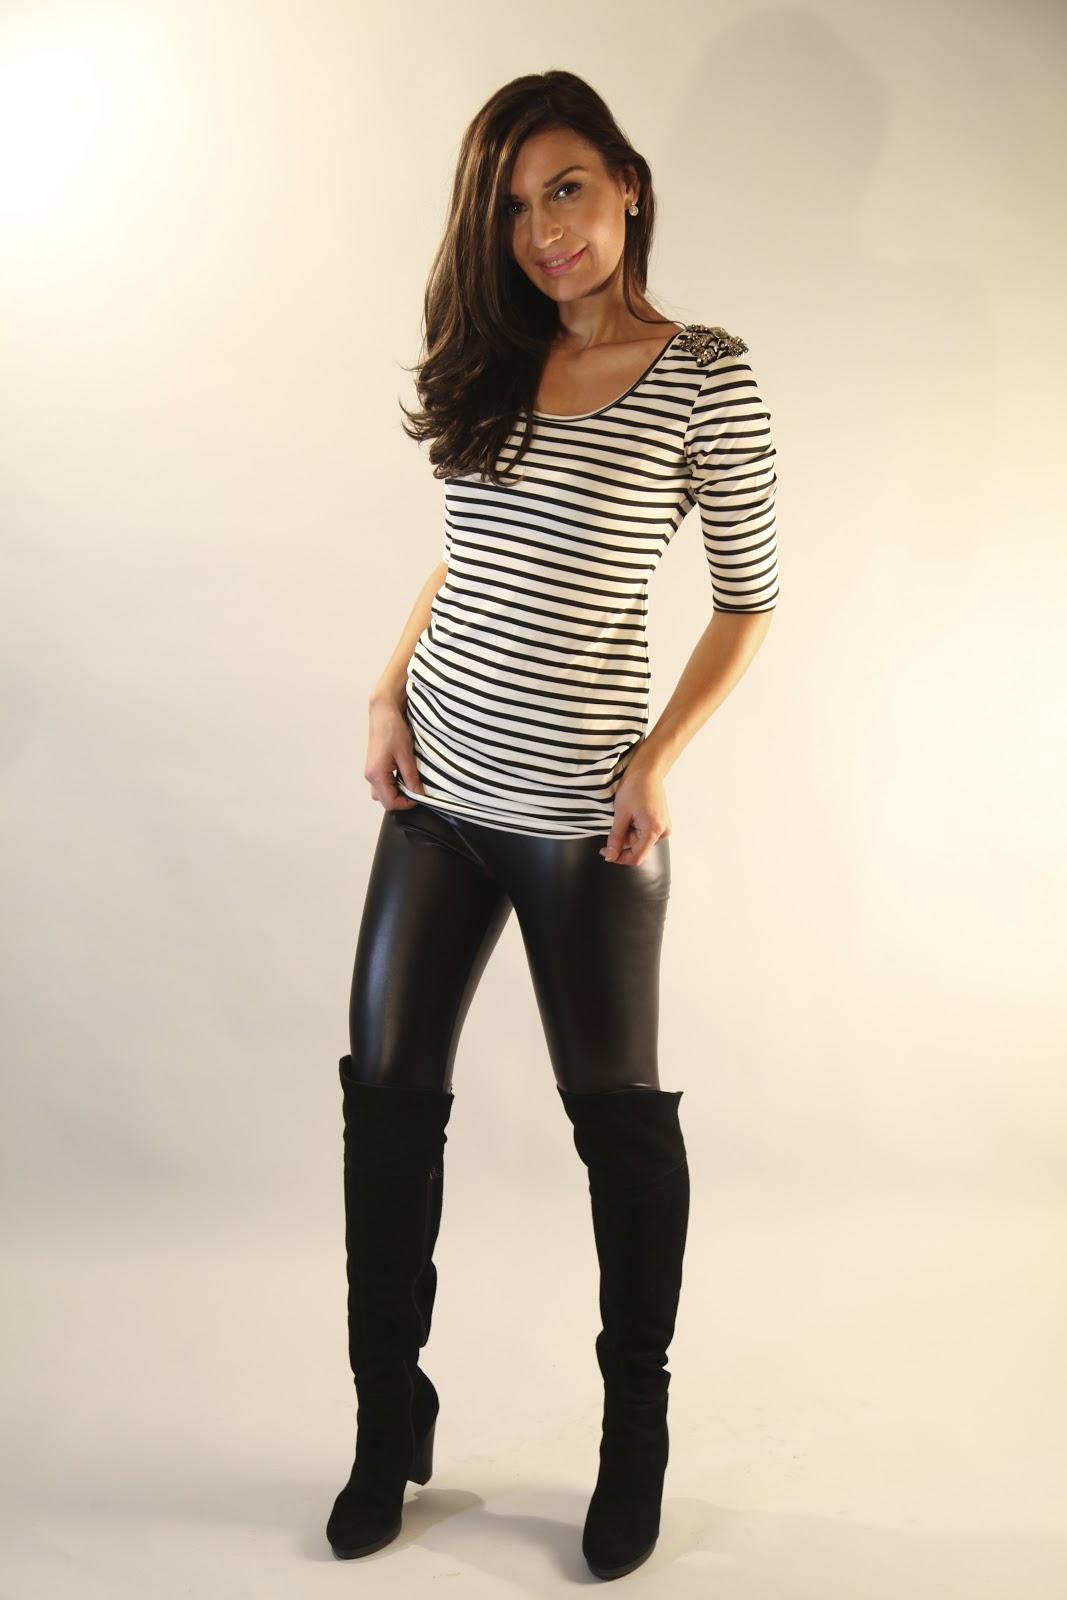 Secrets of a Stylist: How to Wear Leather Leggings